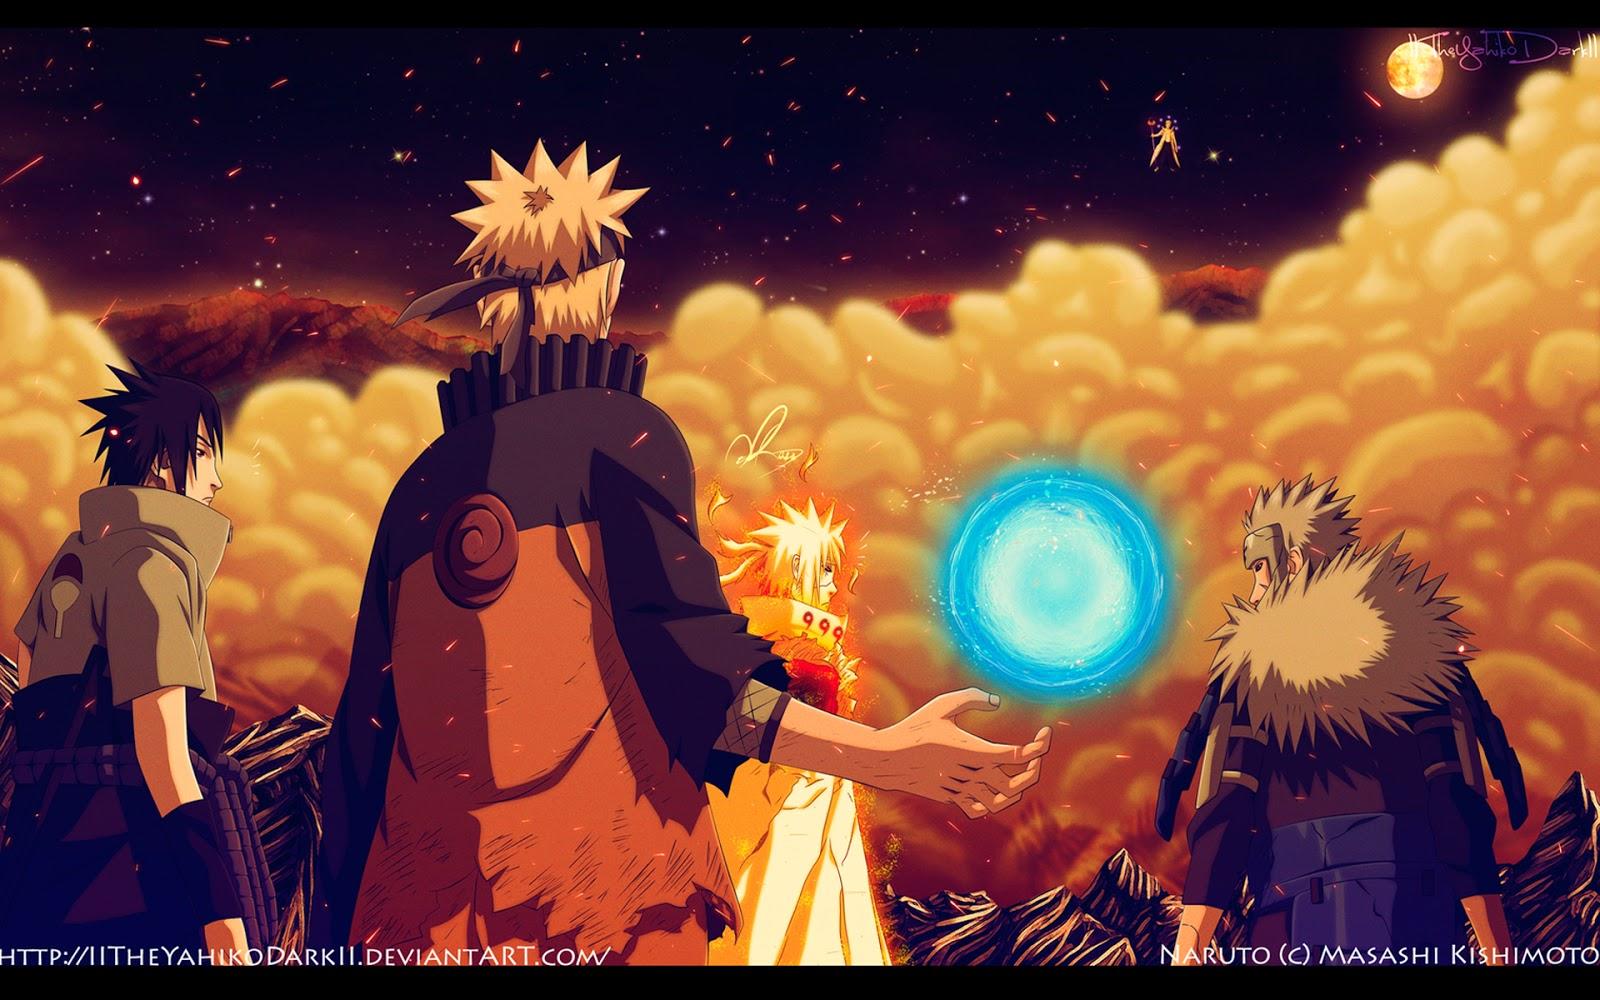 naruto rasengan tobirama senju minato sasuke vs obito hd anime 1600x1000